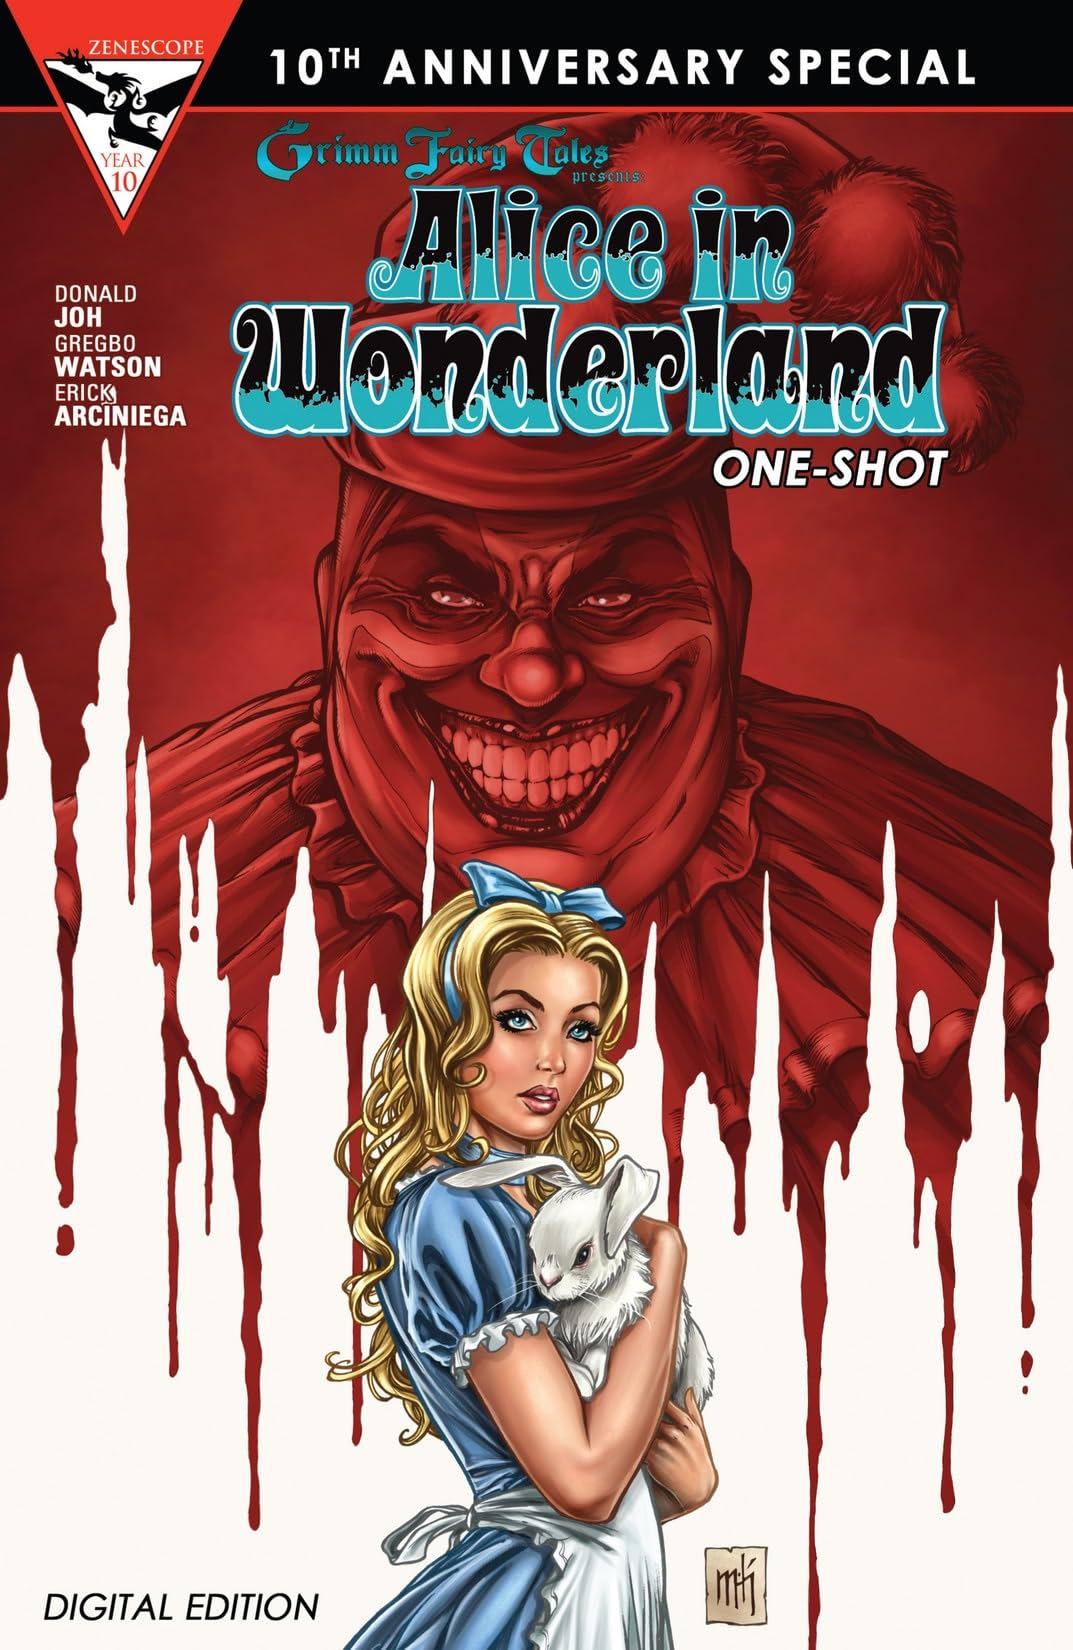 Grimm Fairy Tales 10th Anniversary One Shot - Alice in Wonderland